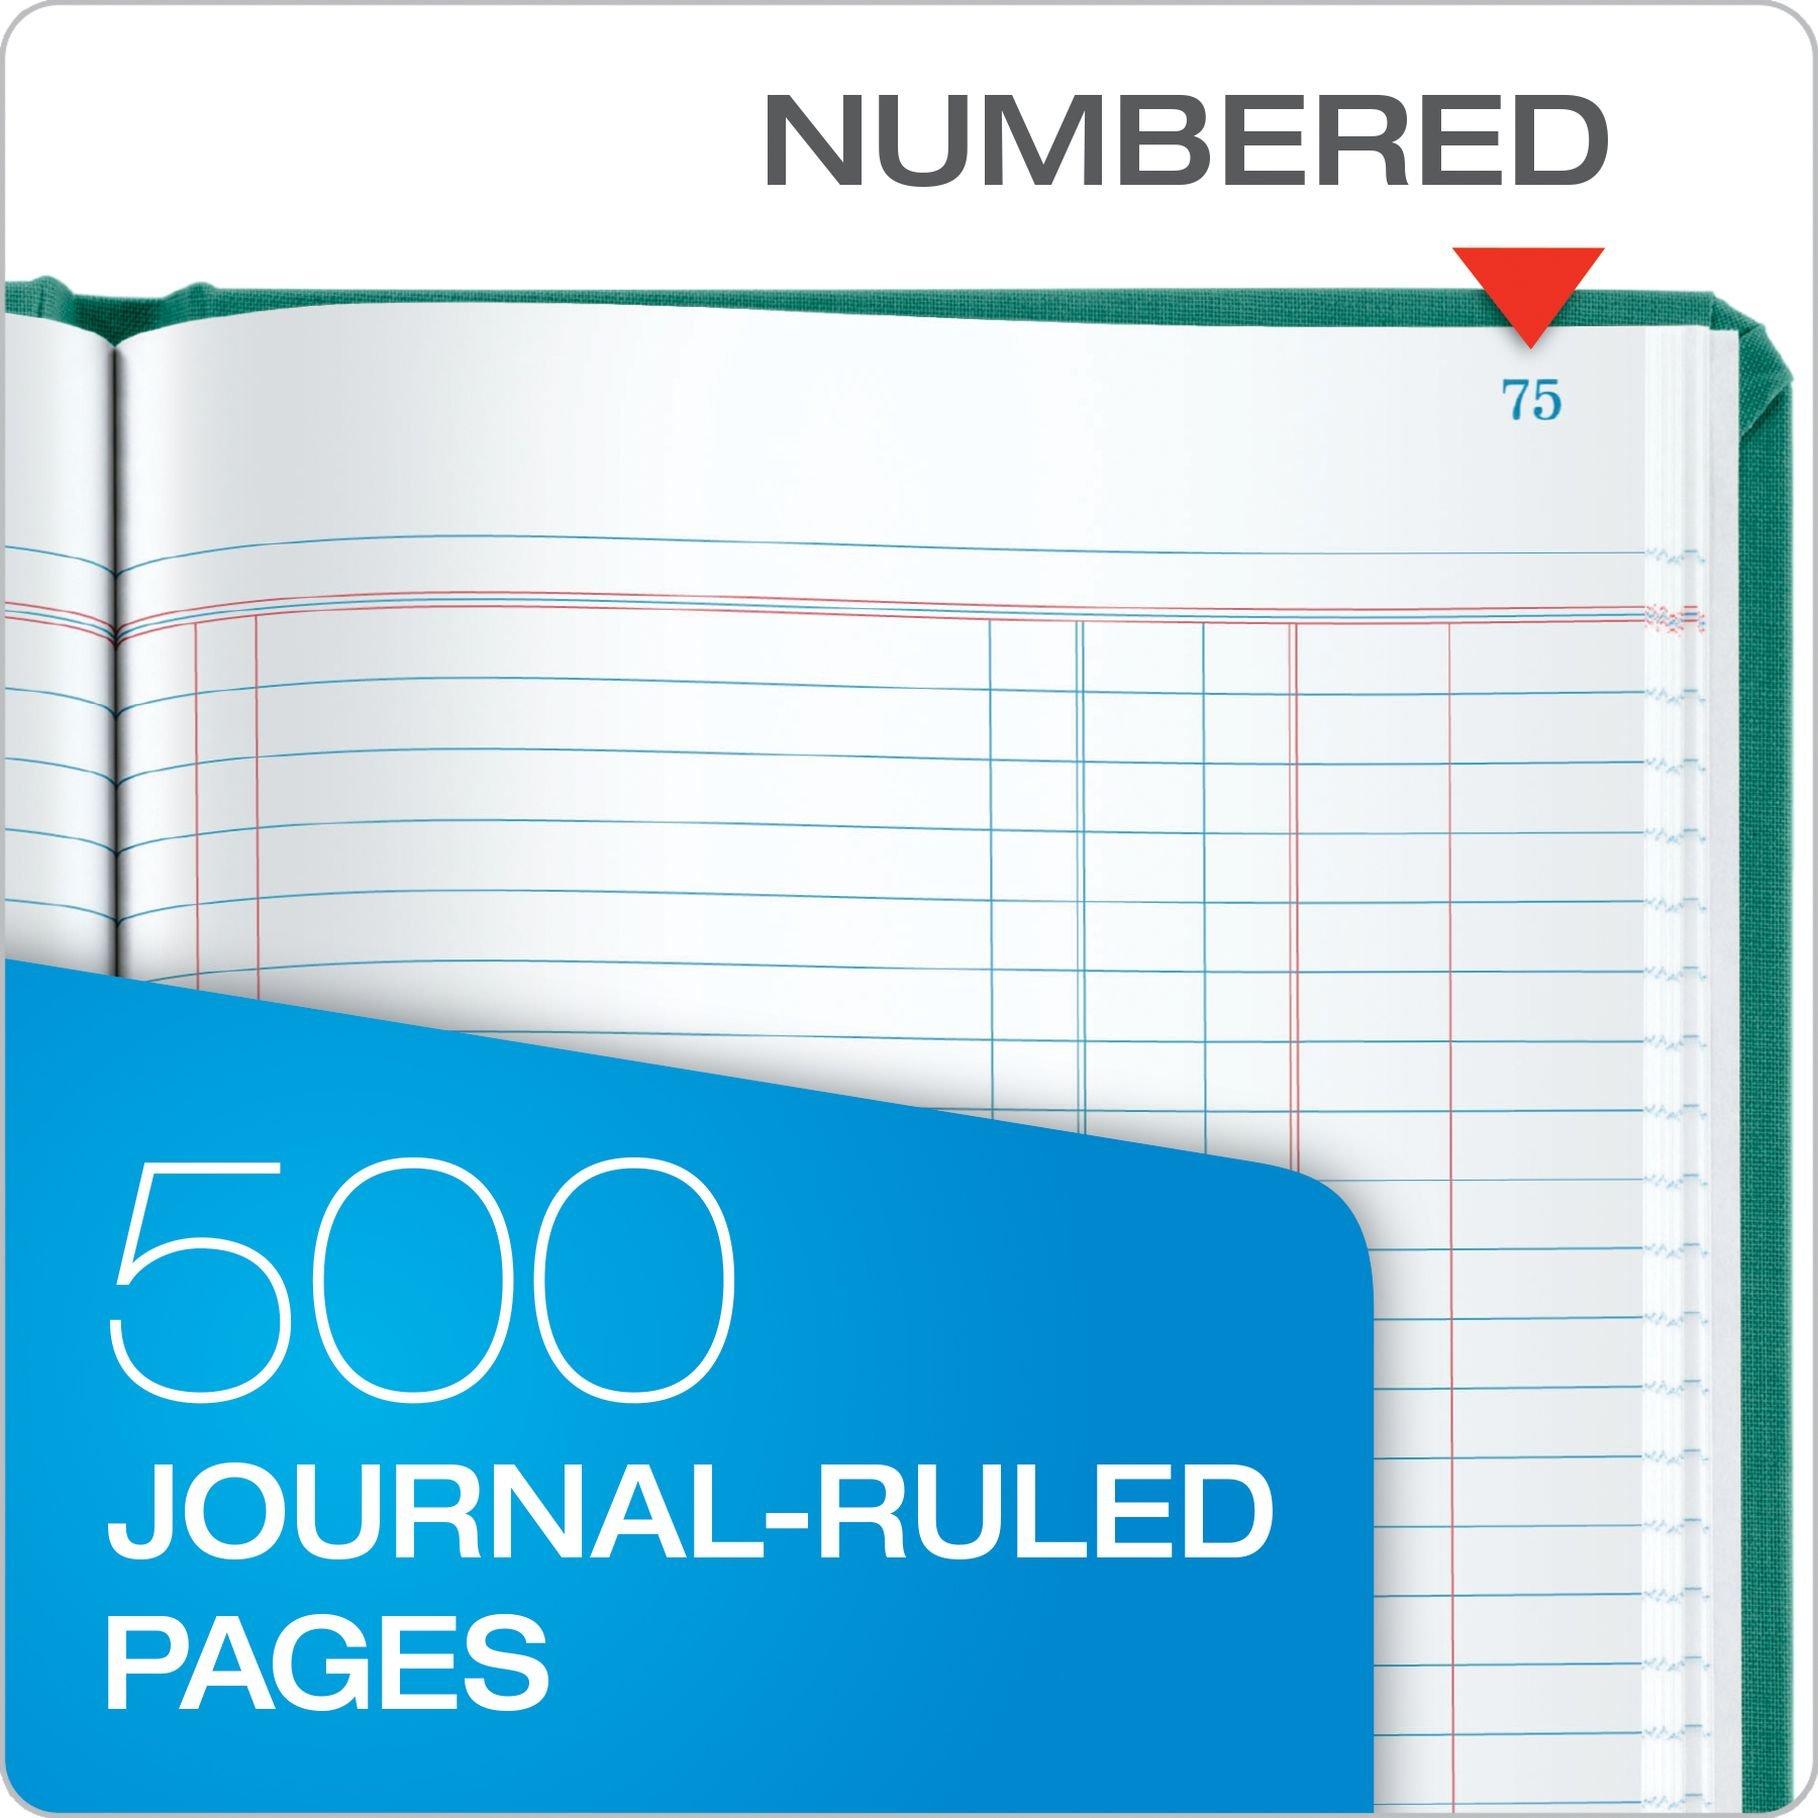 Boorum & Pease 66 Series Account Book, Journal Ruled, Green, 500 Pages, 12-1/8'' x 7-5/8'' (66-500-J) by Boorum & Pease (Image #3)